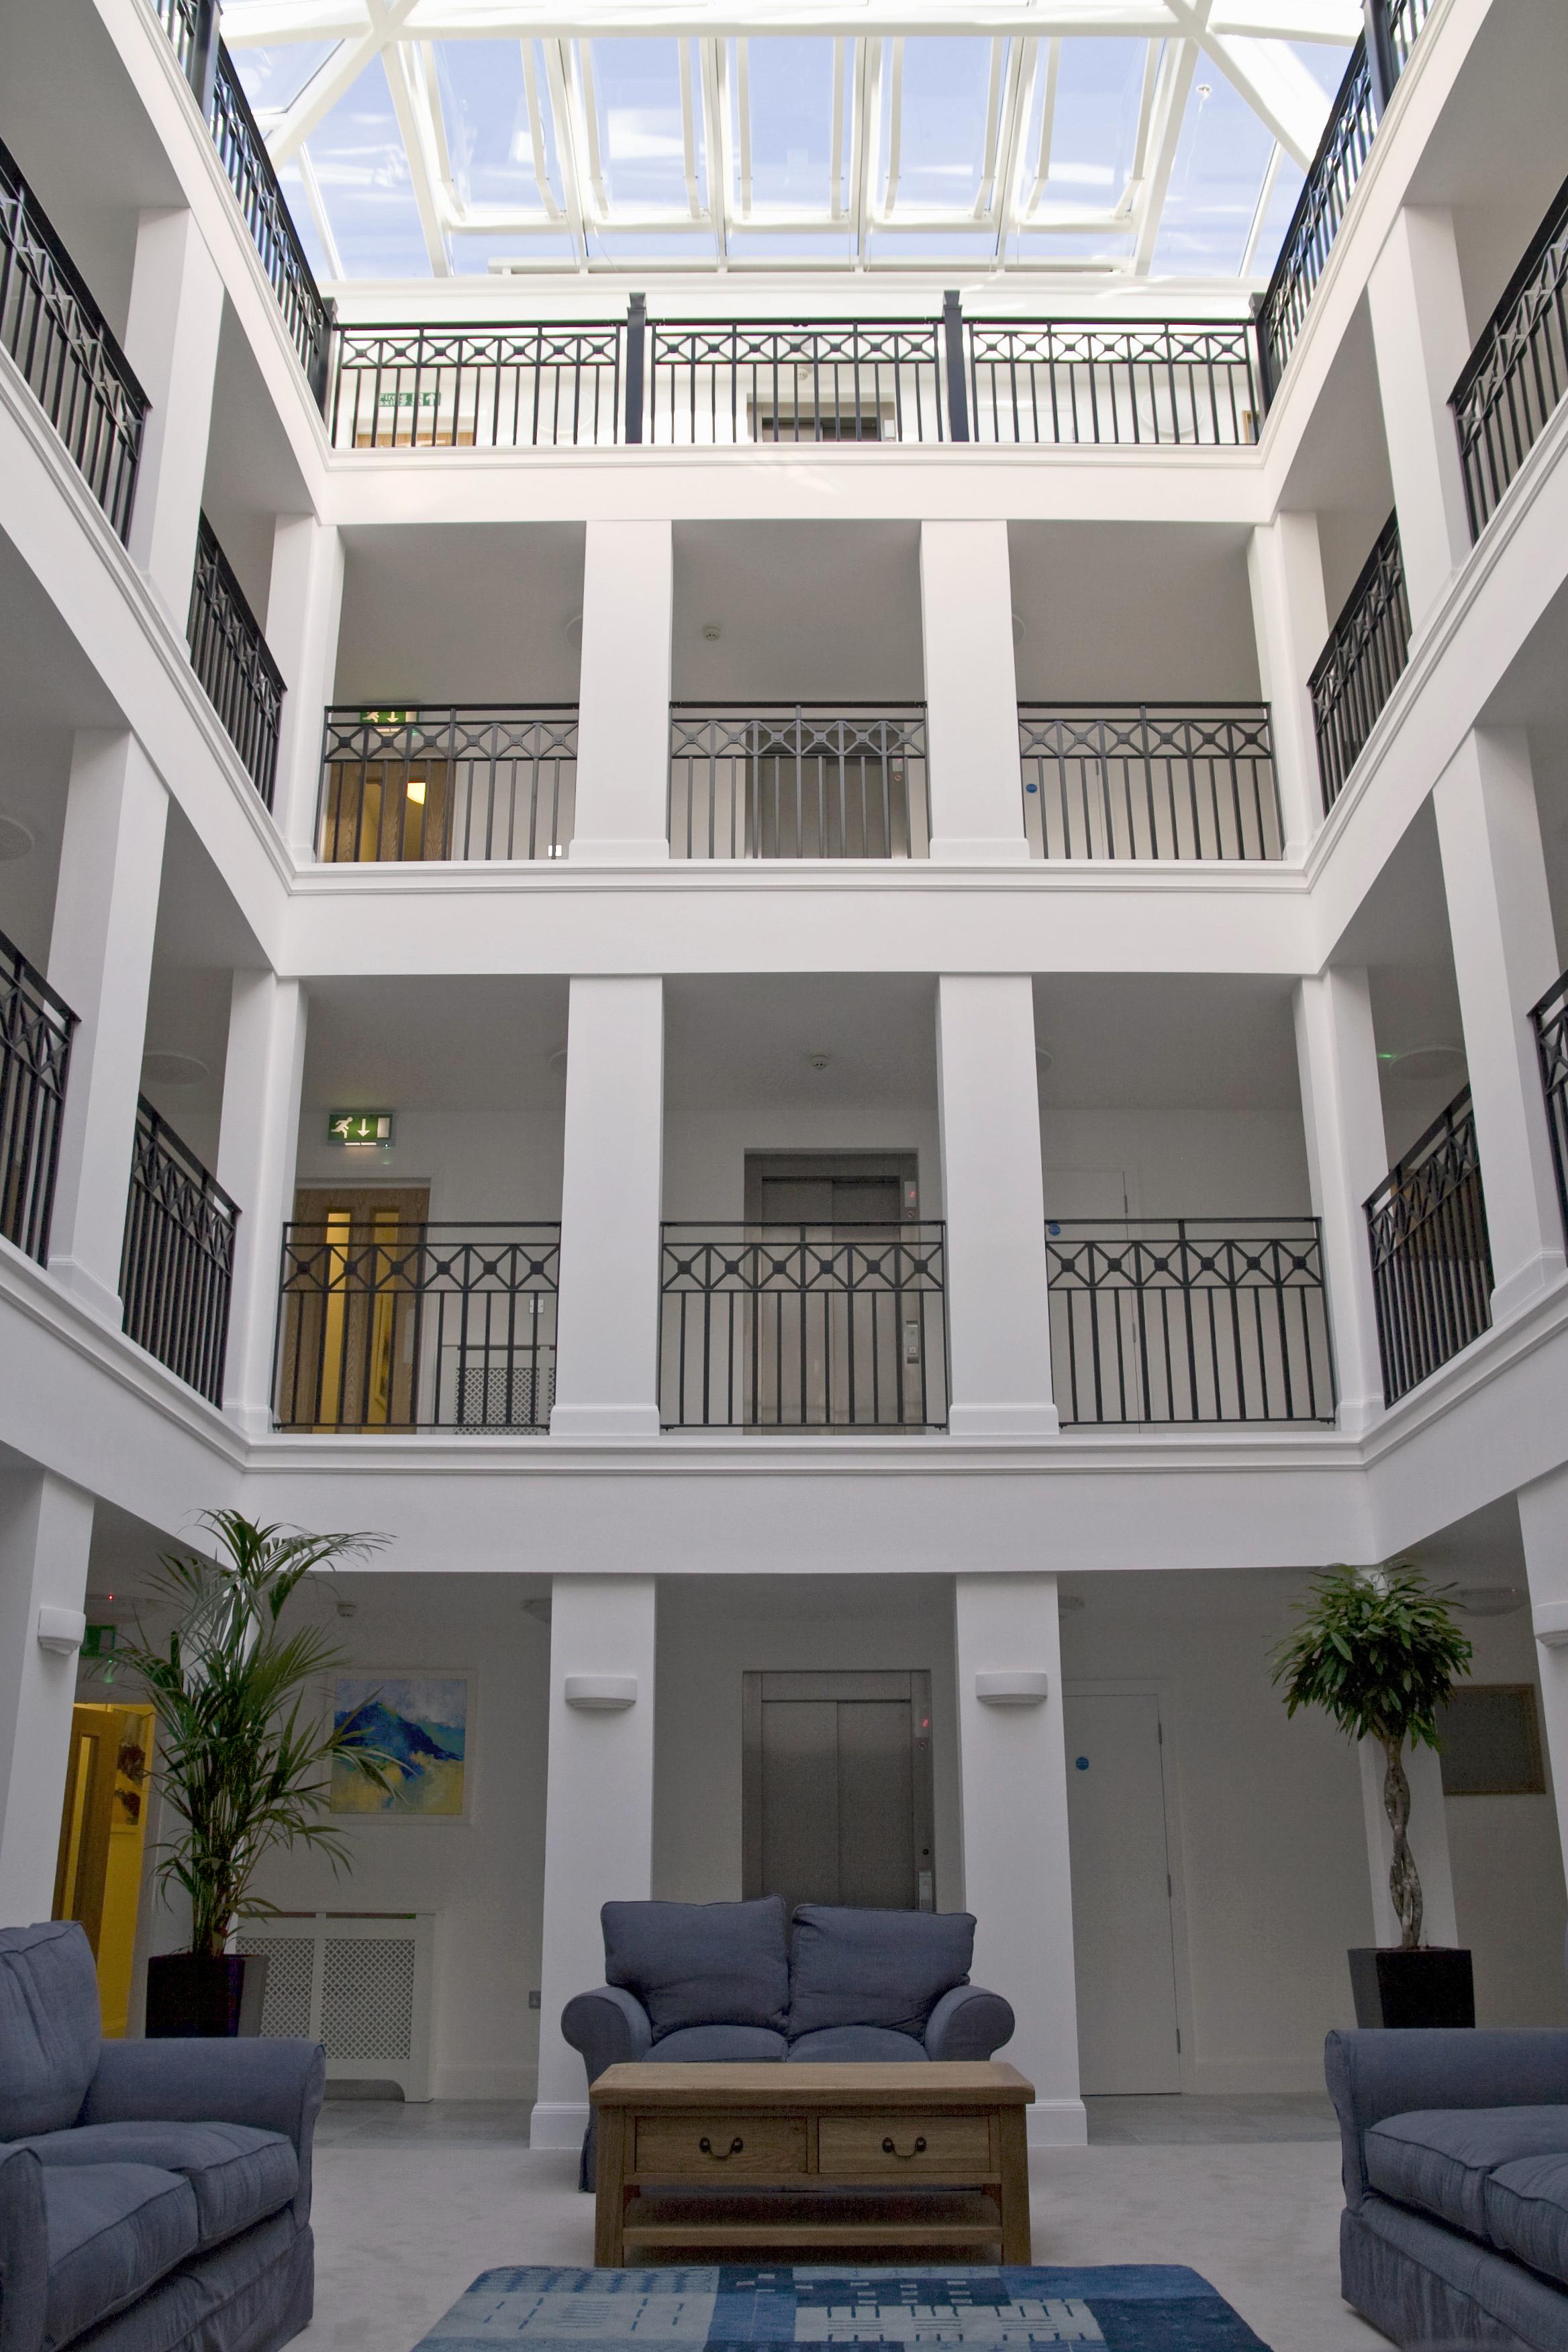 Sanditon apartments, Sidmouth, Devon - classical atrium